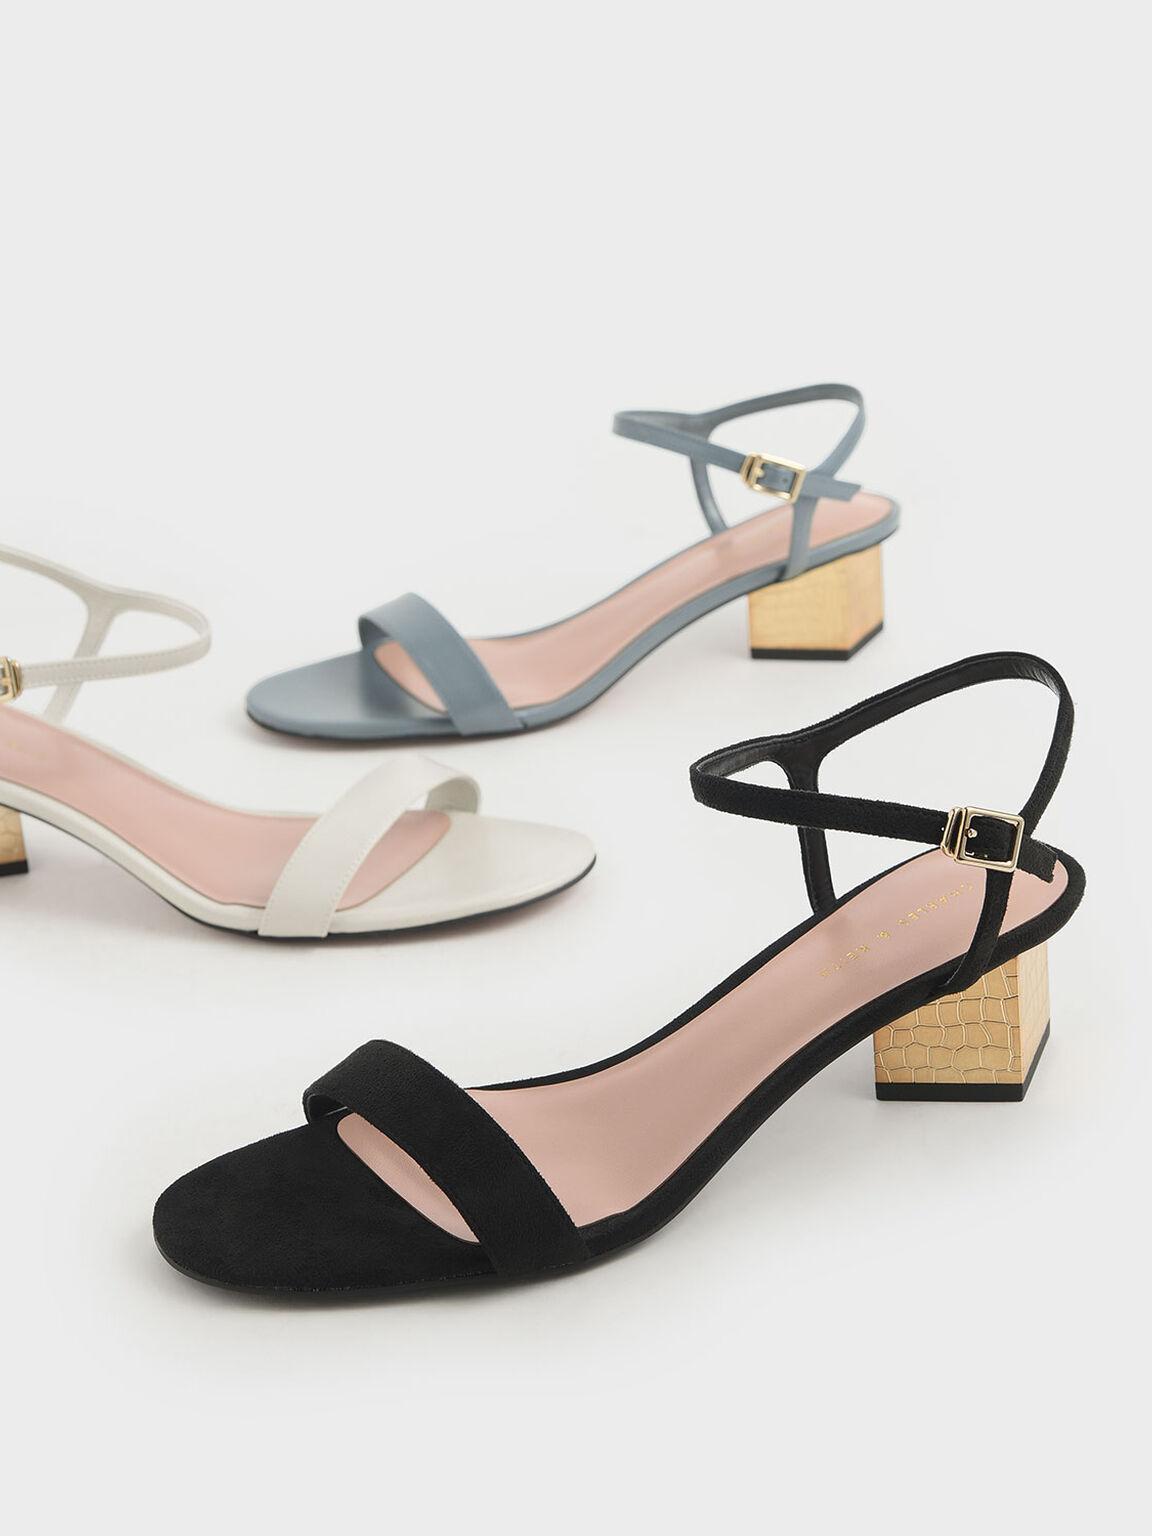 Sculptural Chrome Heel Textured Sandals, Black, hi-res